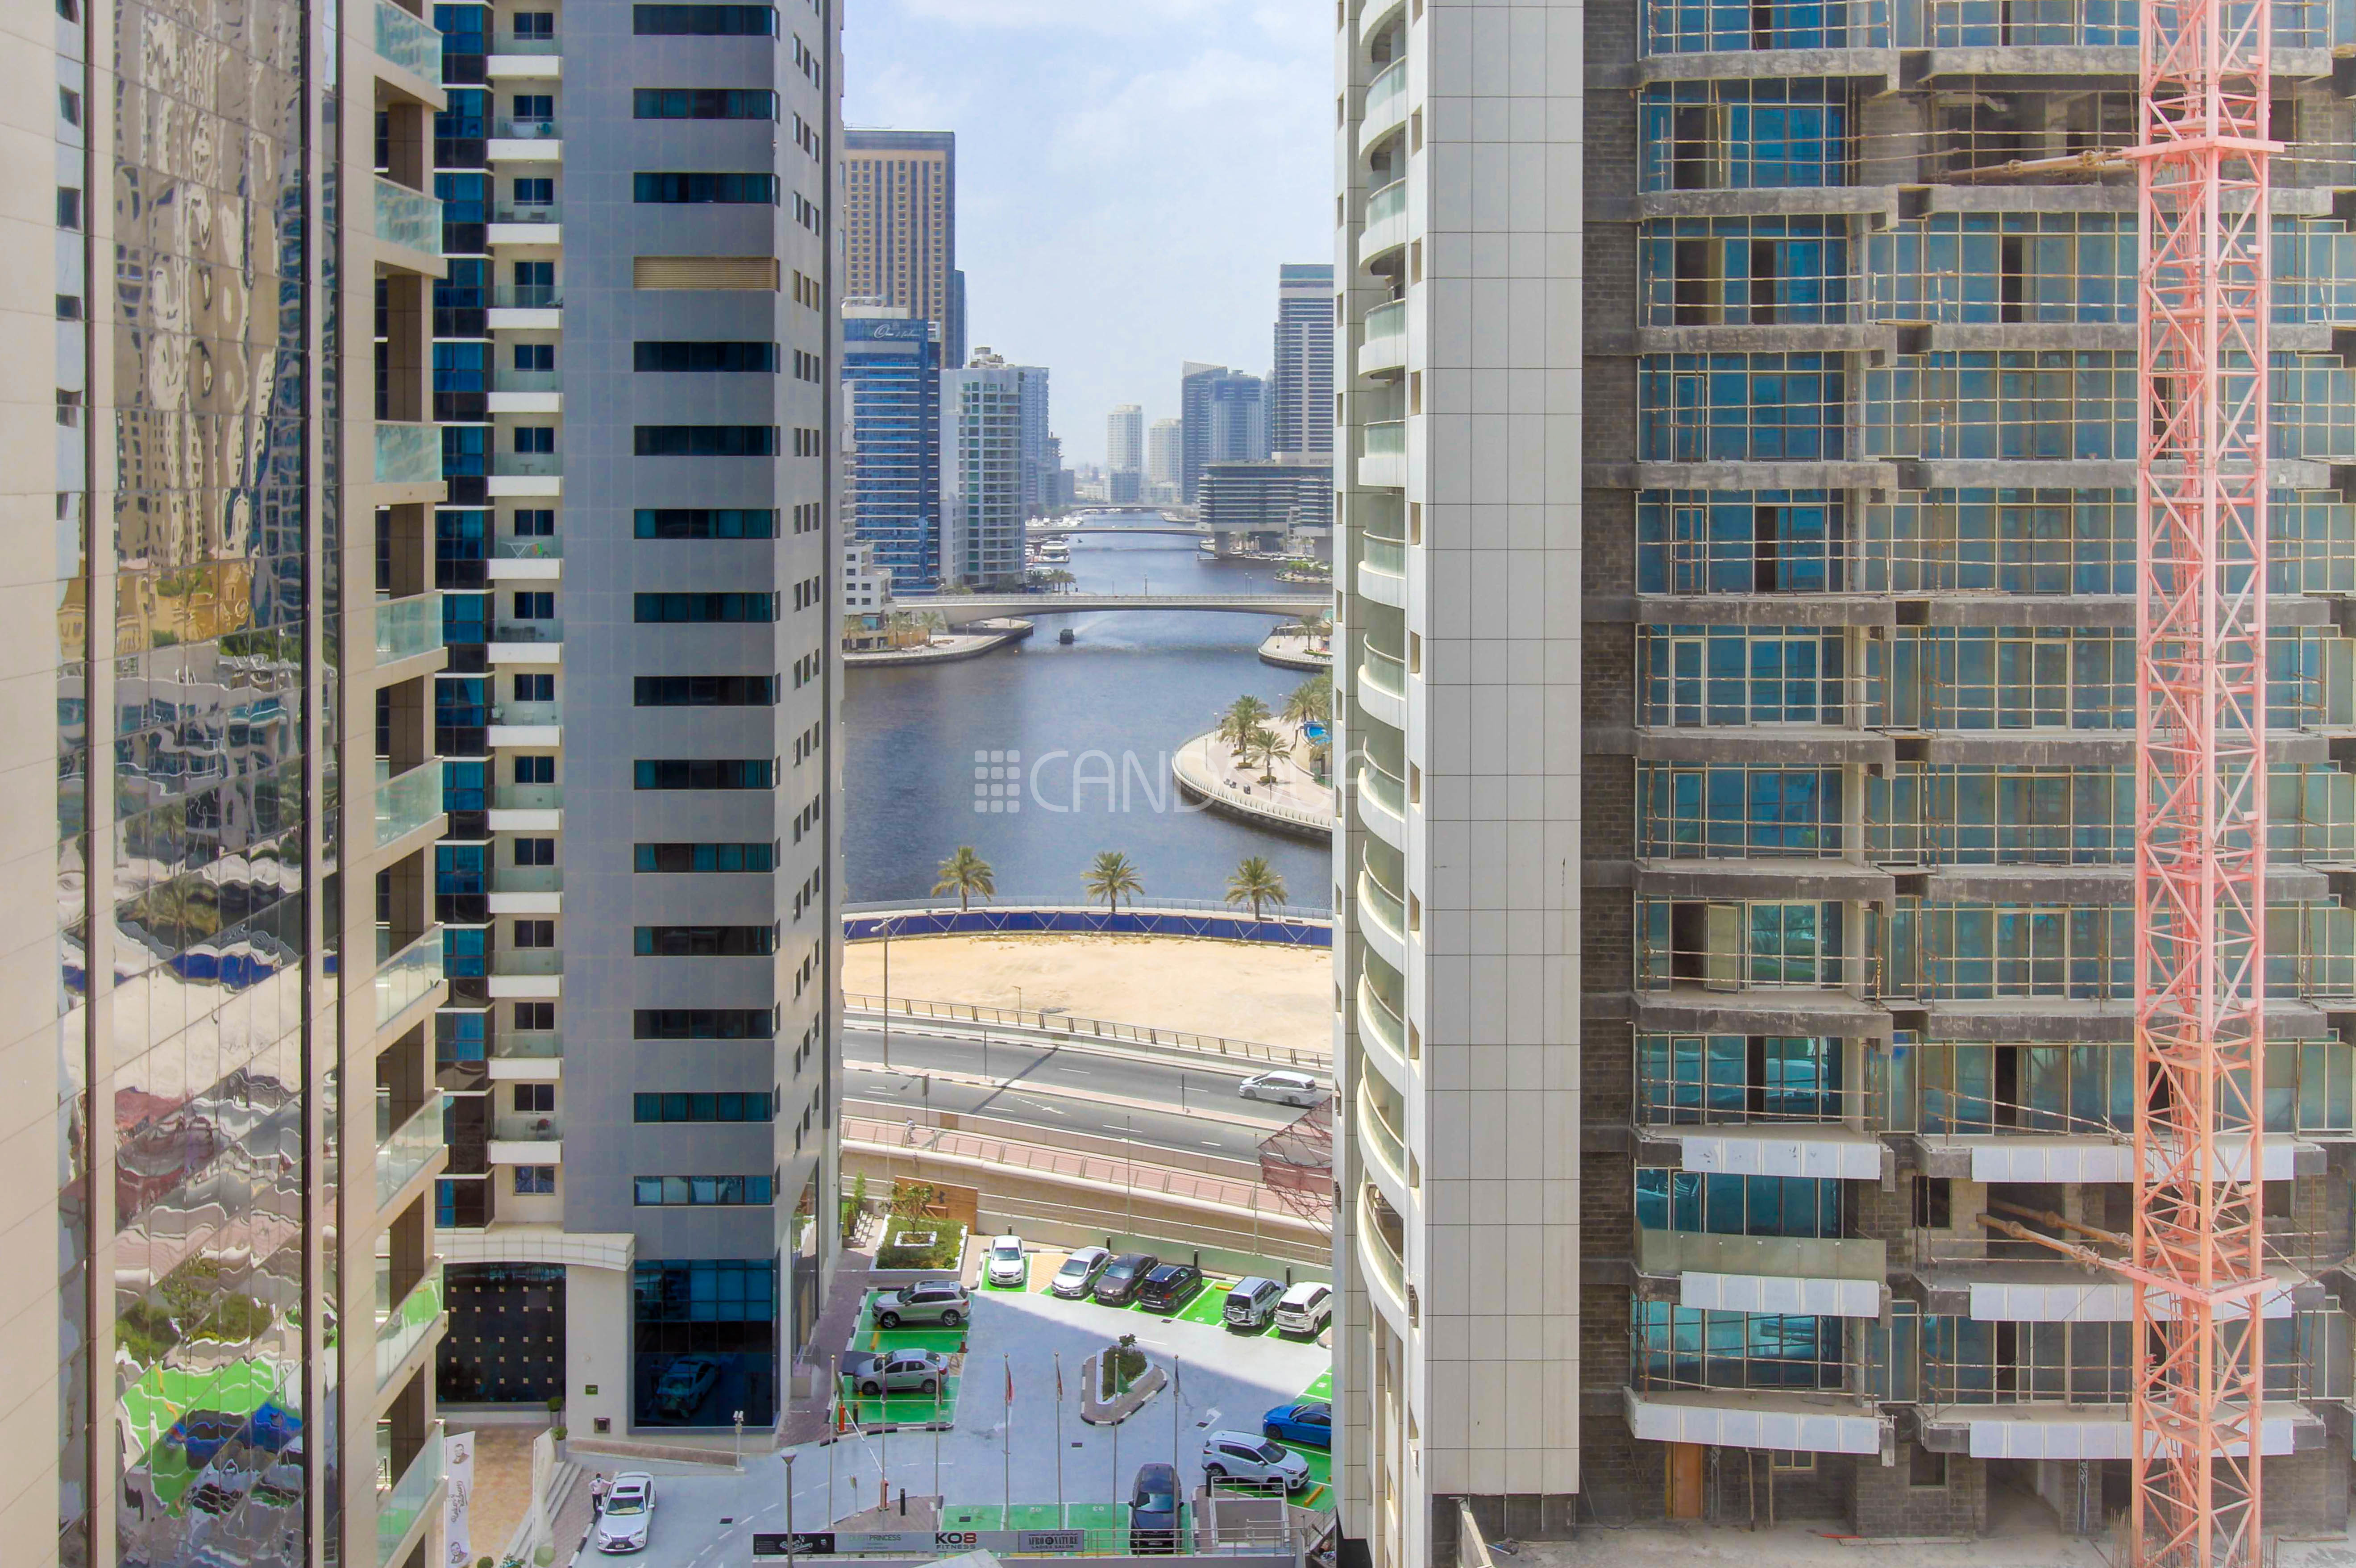 1 Bedroom Apt | Great View | Marina Tower